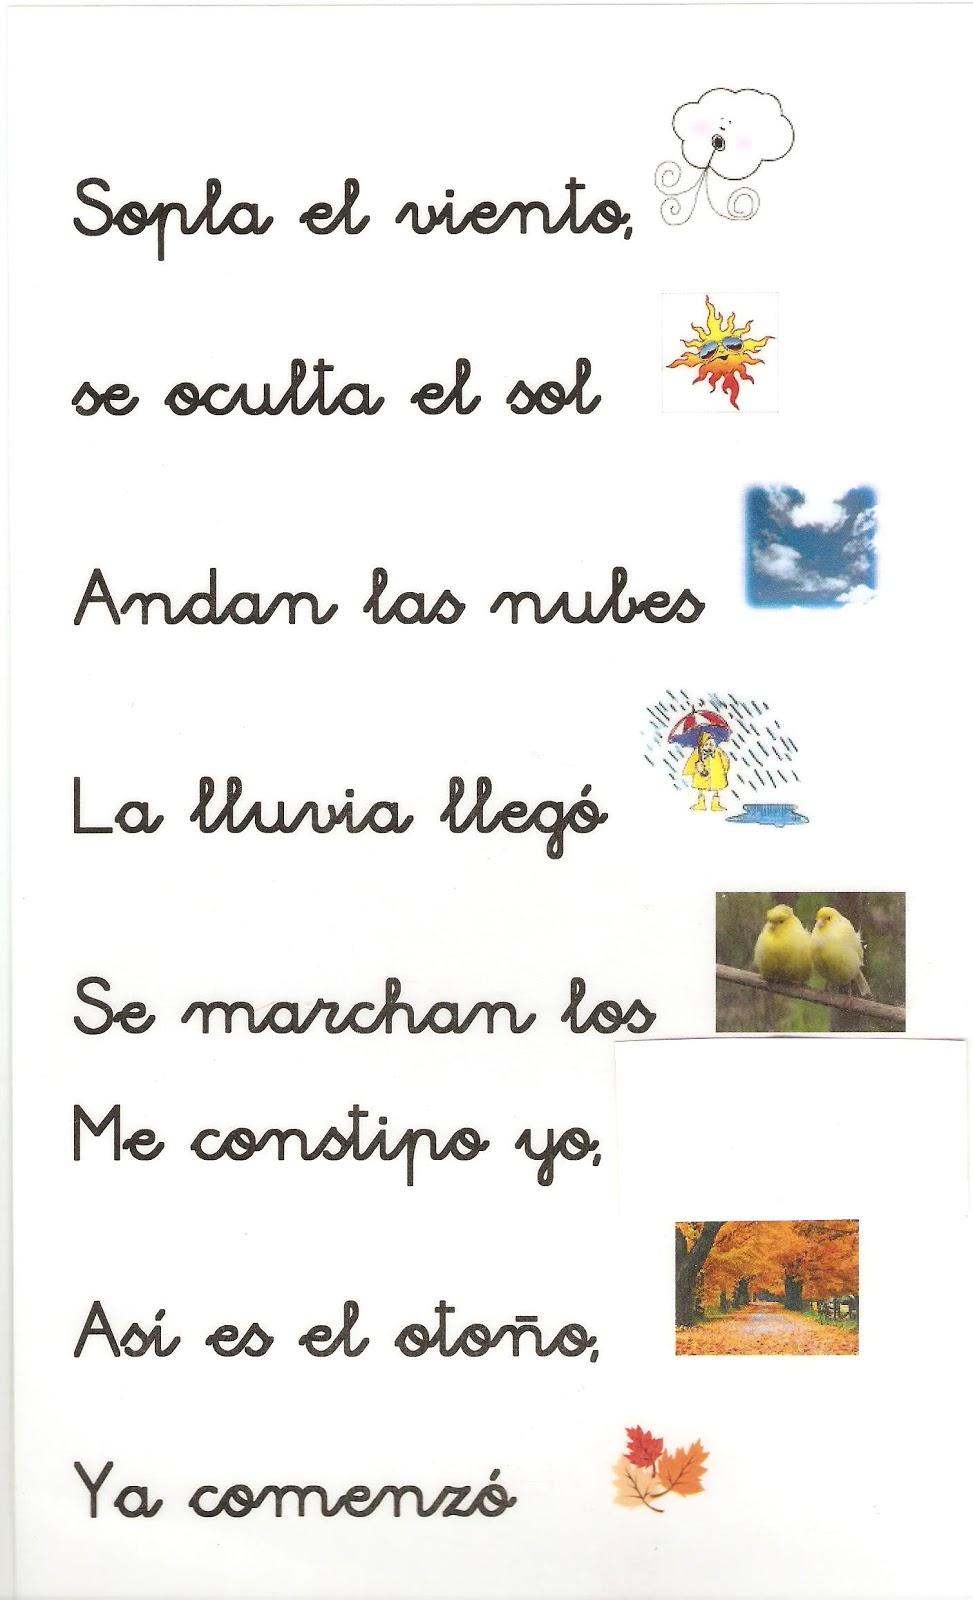 Frases Sobre El Otoo Frases Sobre El Otoo With Frases Sobre El Otoo